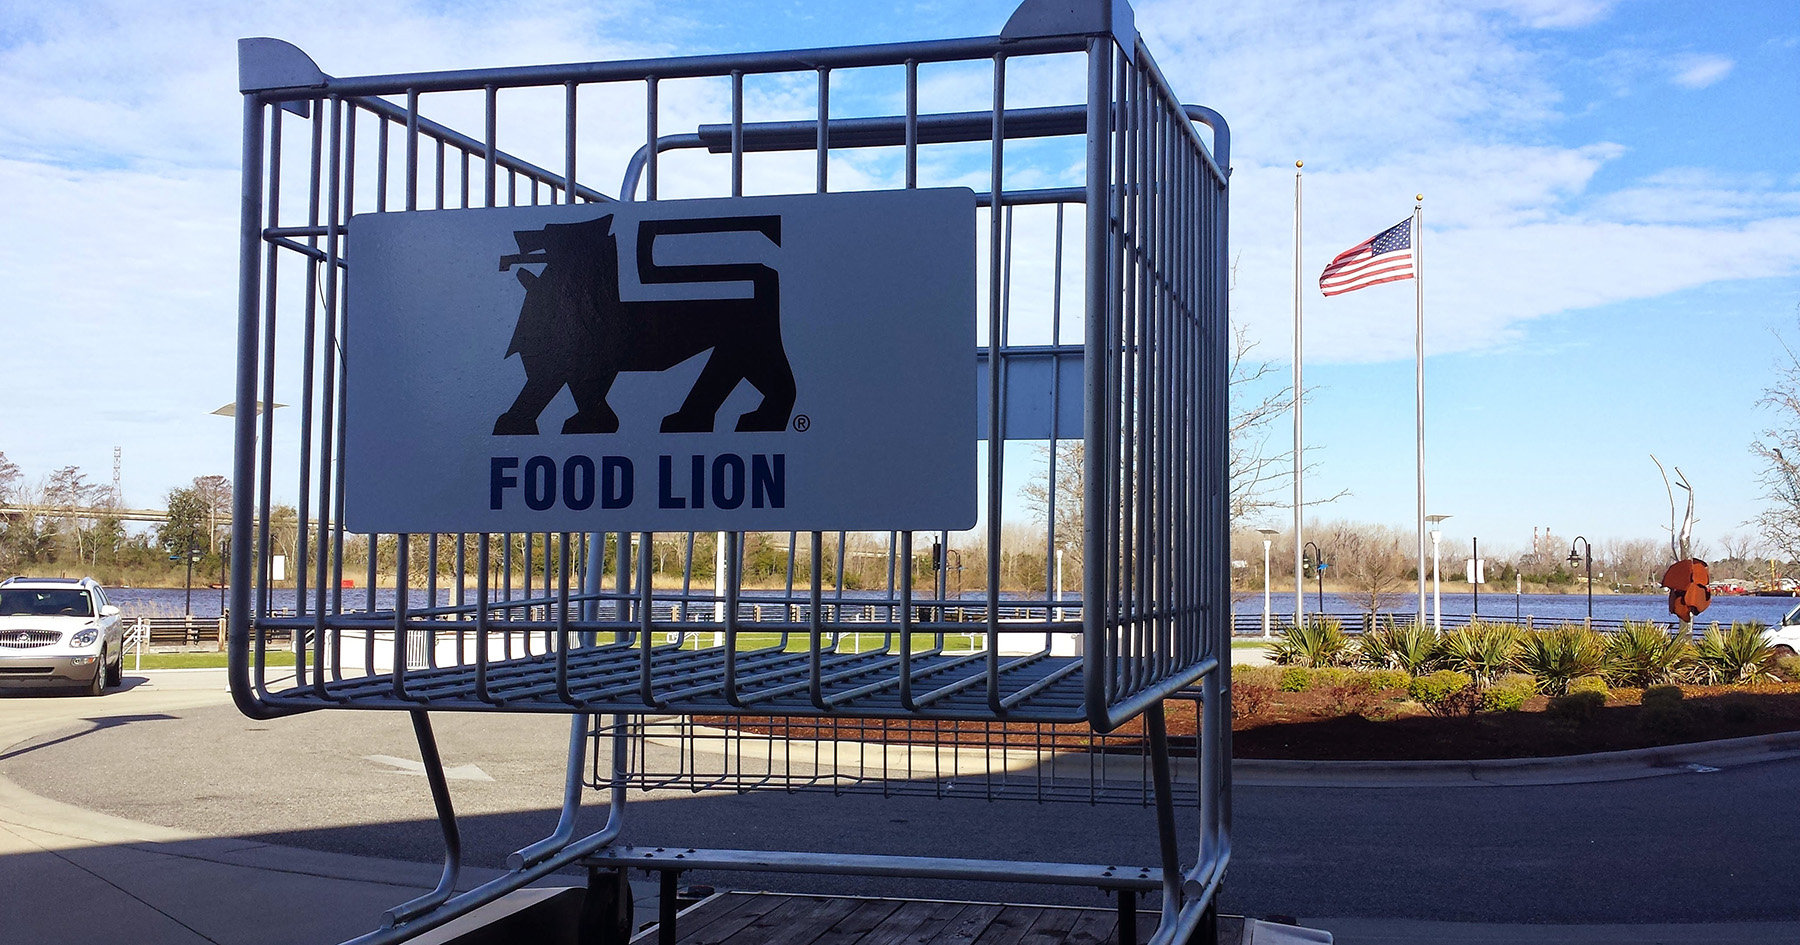 Bi Lo Stores >> Food Lion to Buy 4 South Carolina Bi-Lo Stores